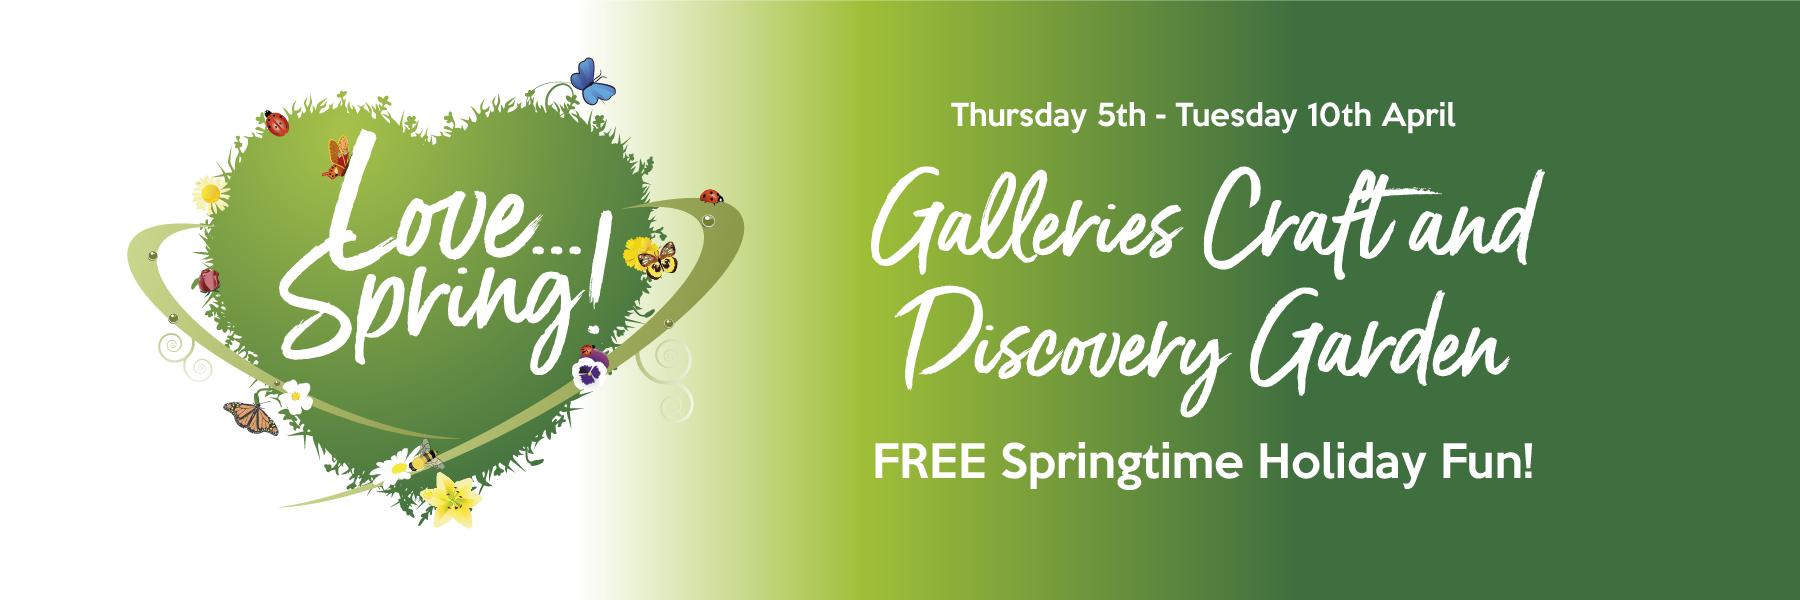 Craft & Discovery Garden